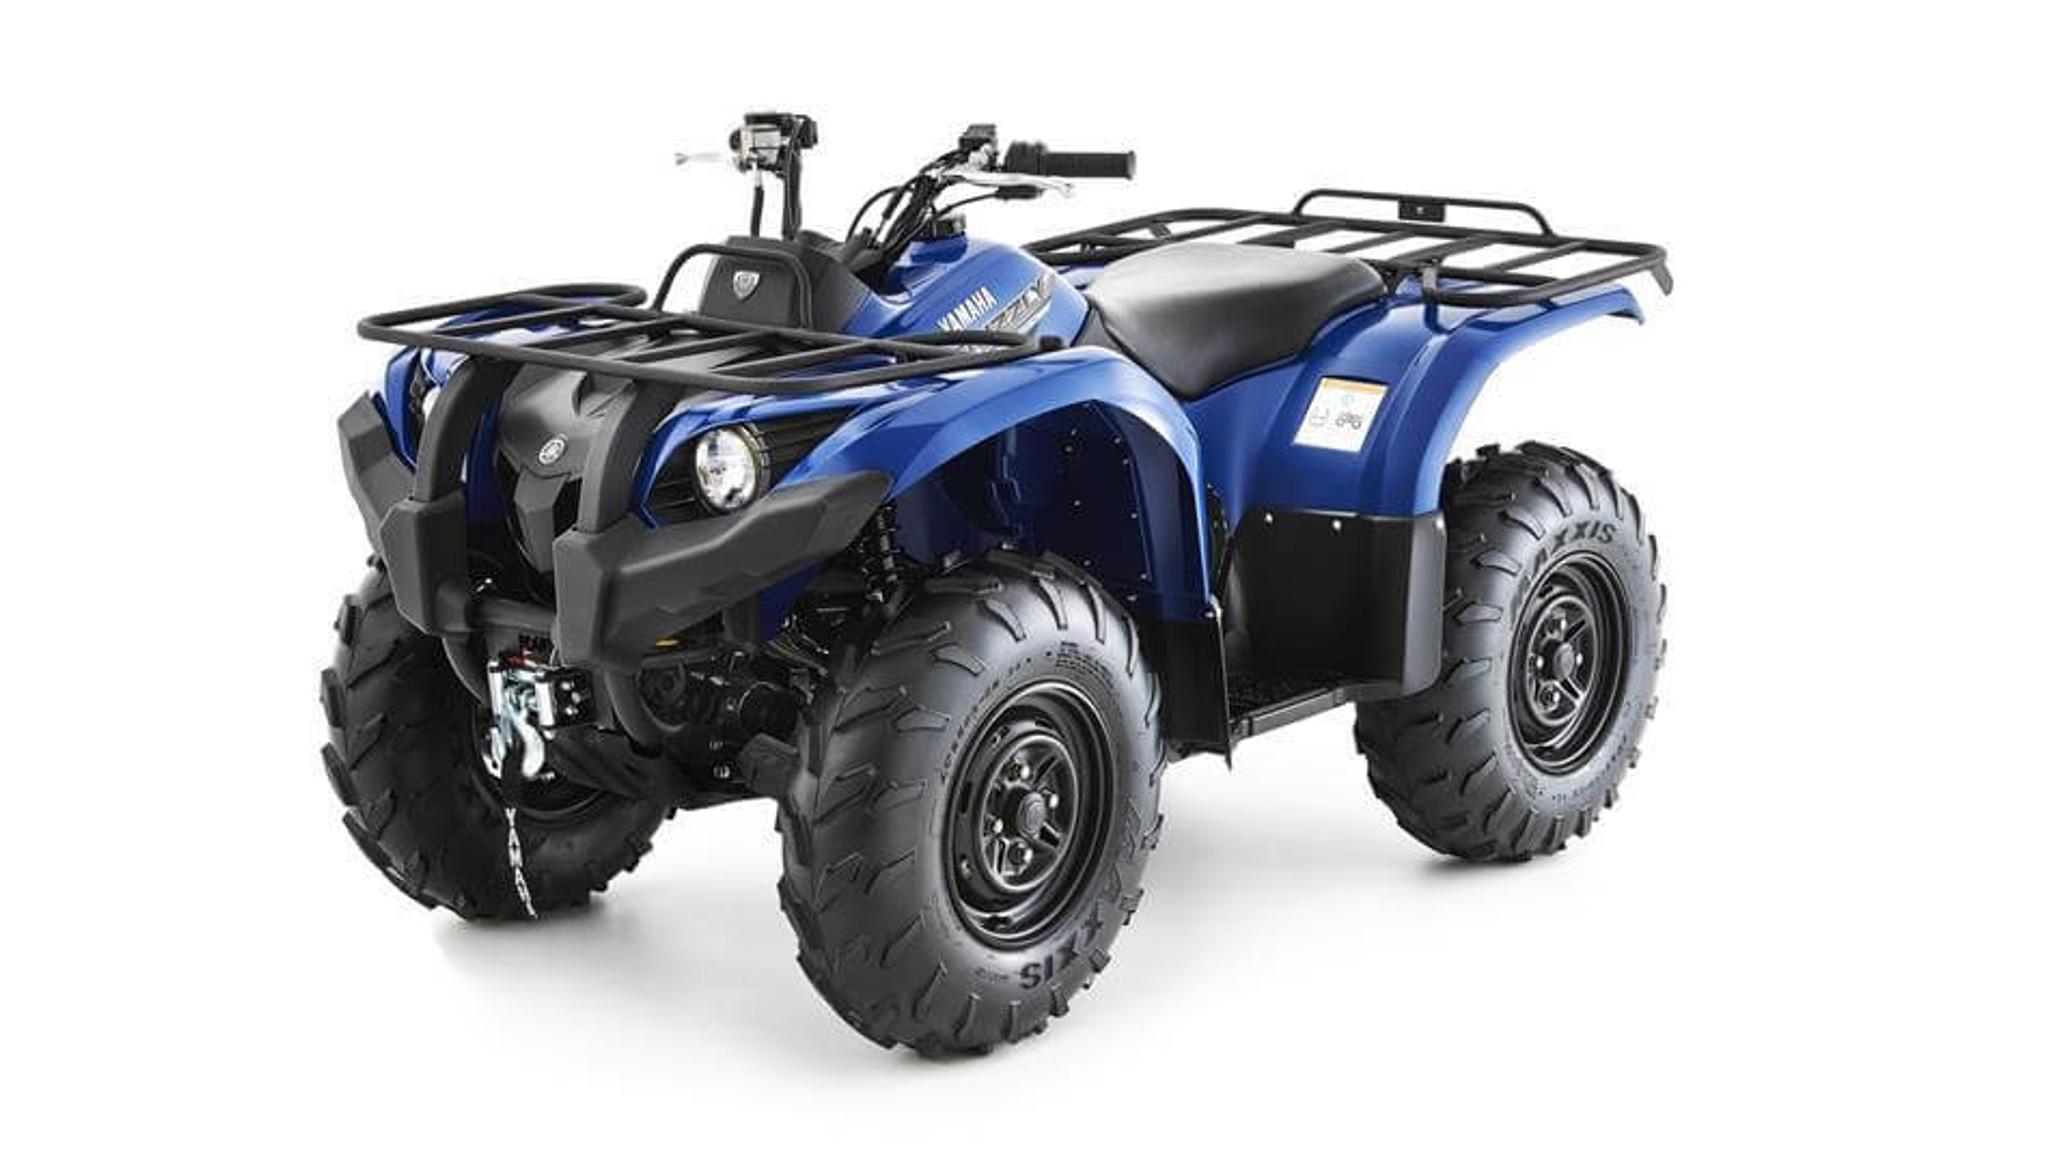 Yamaha Grizzly 450 >> Yamaha Grizzly 450